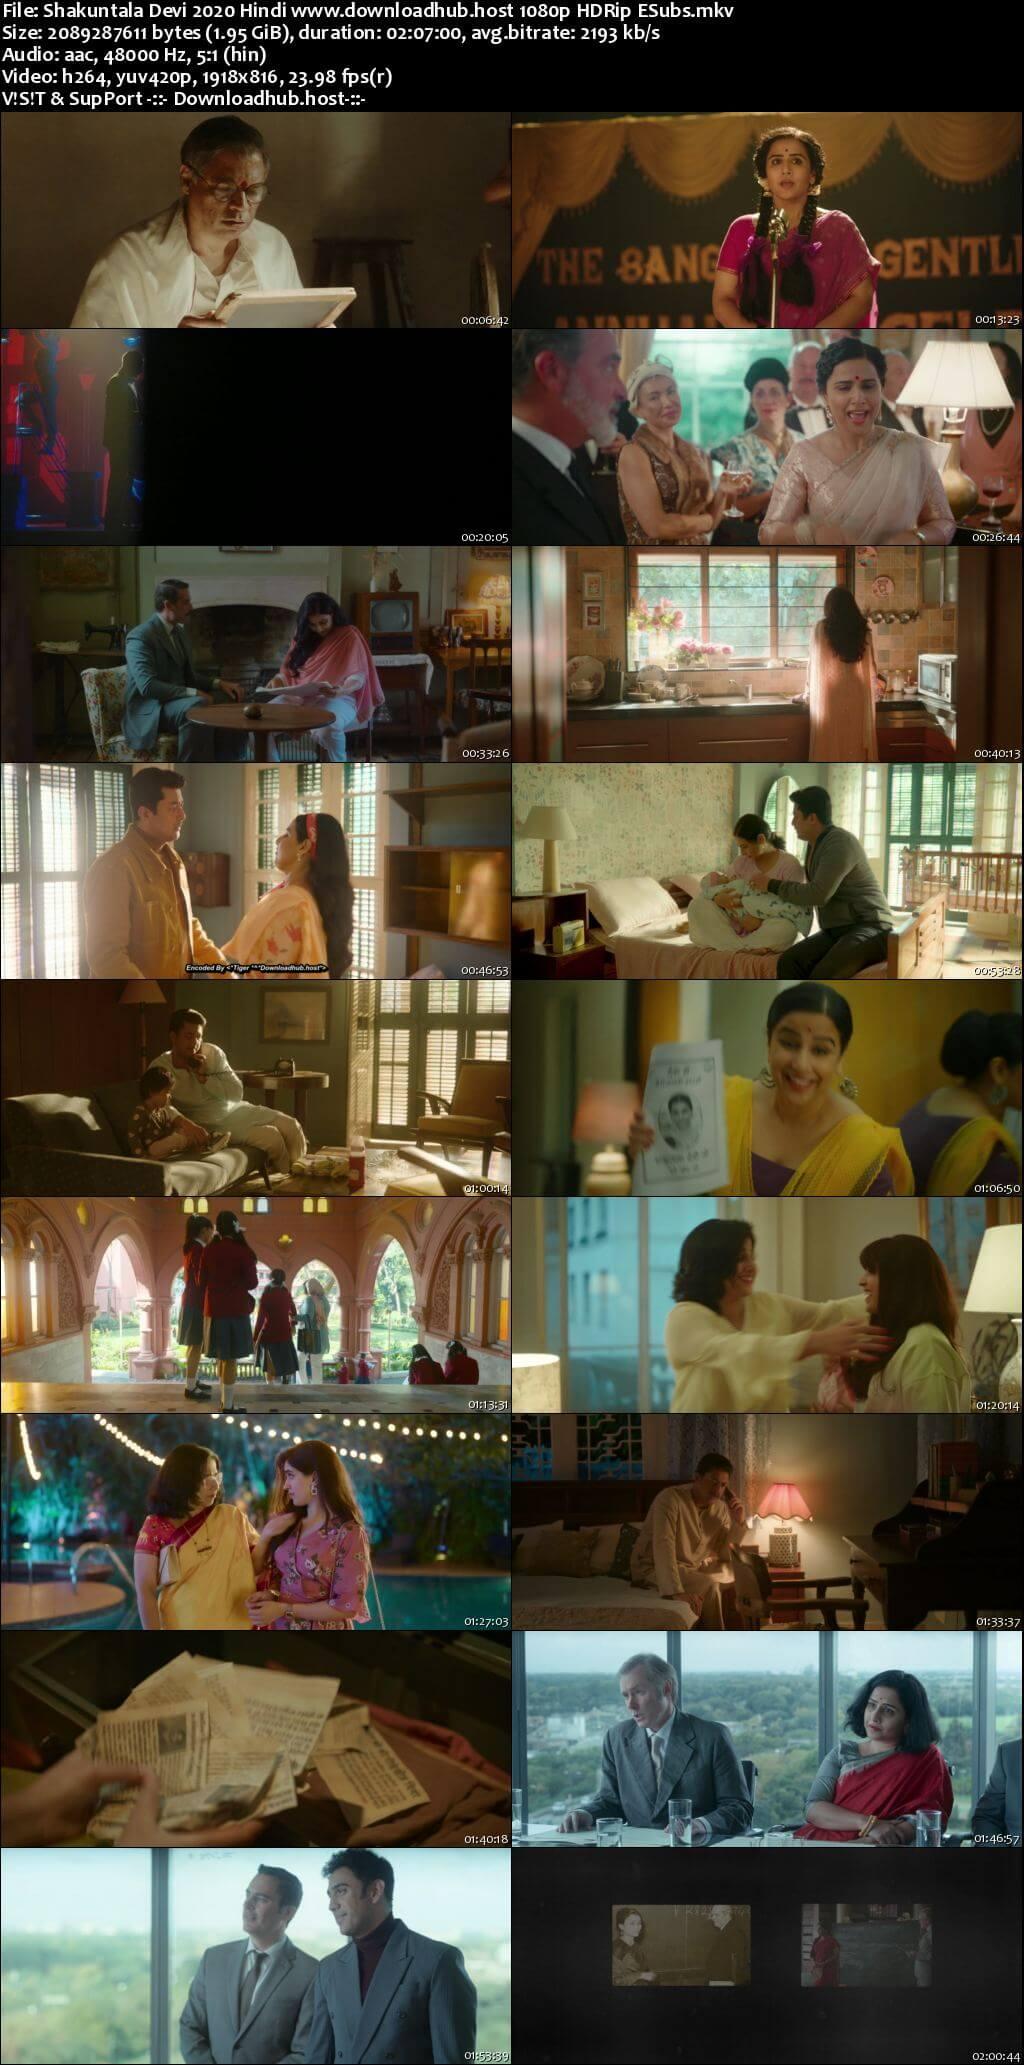 Shakuntala Devi 2020 Hindi 1080p HDRip ESubs